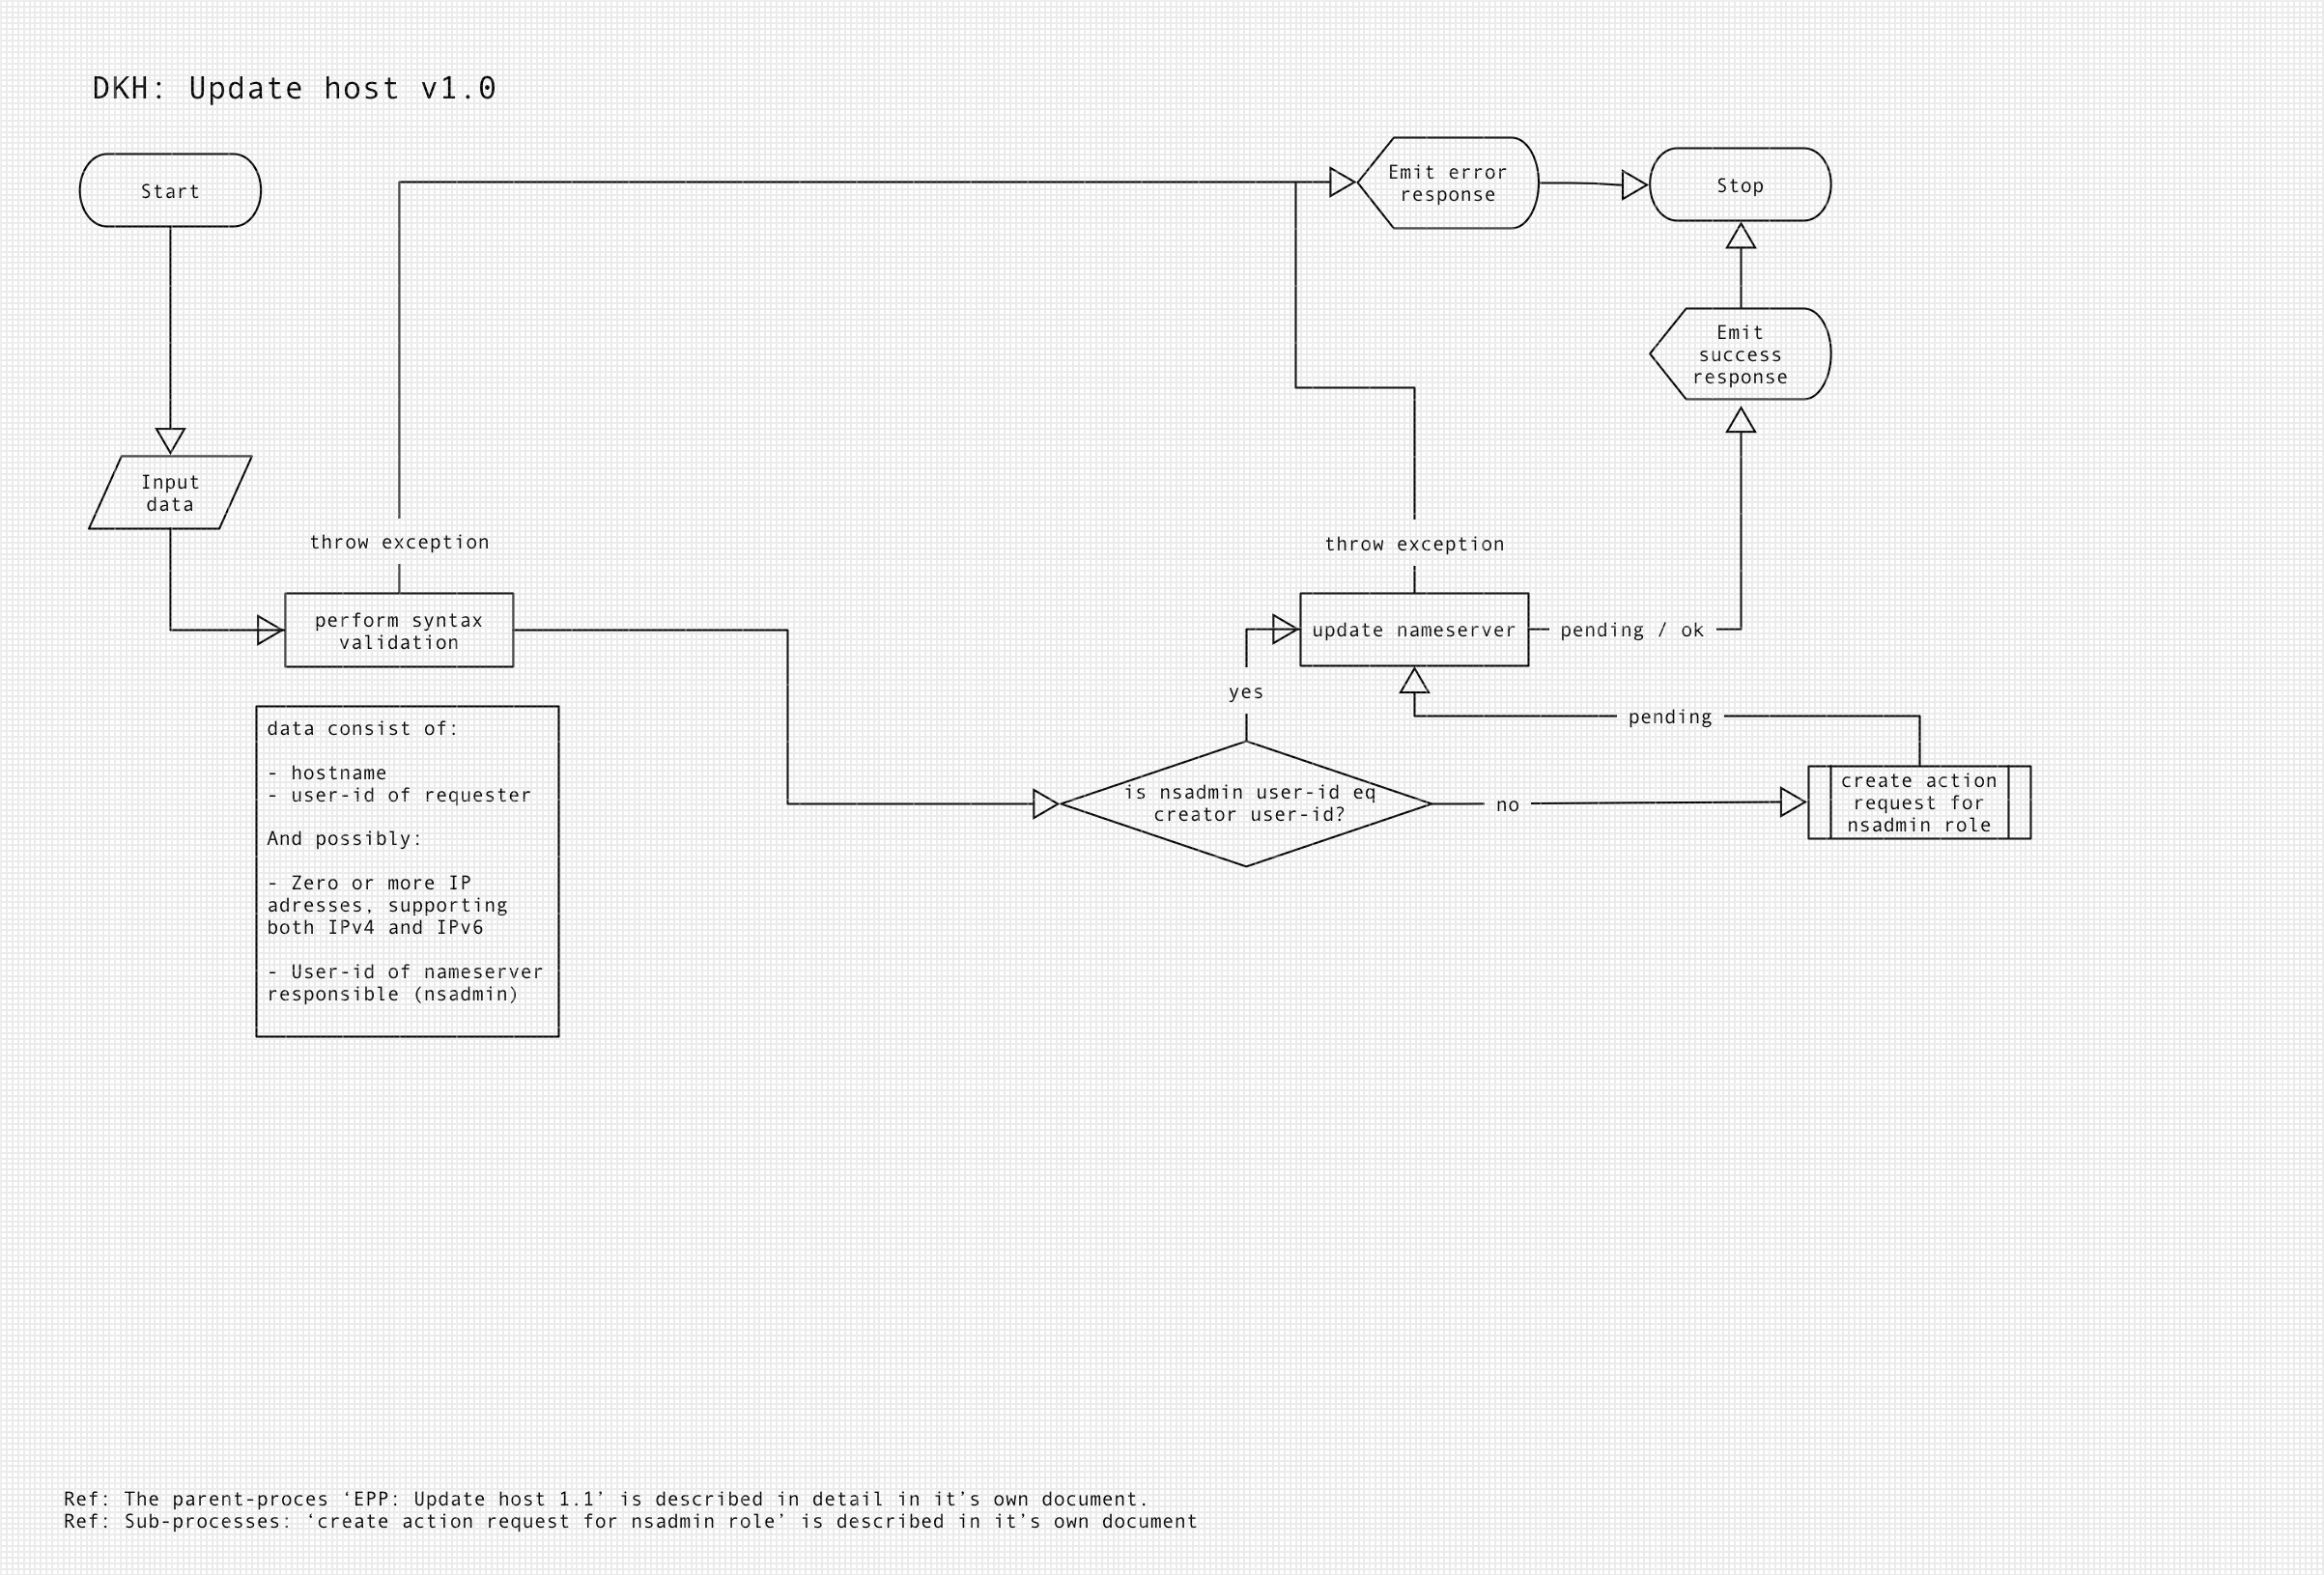 Diagram of DKH update host